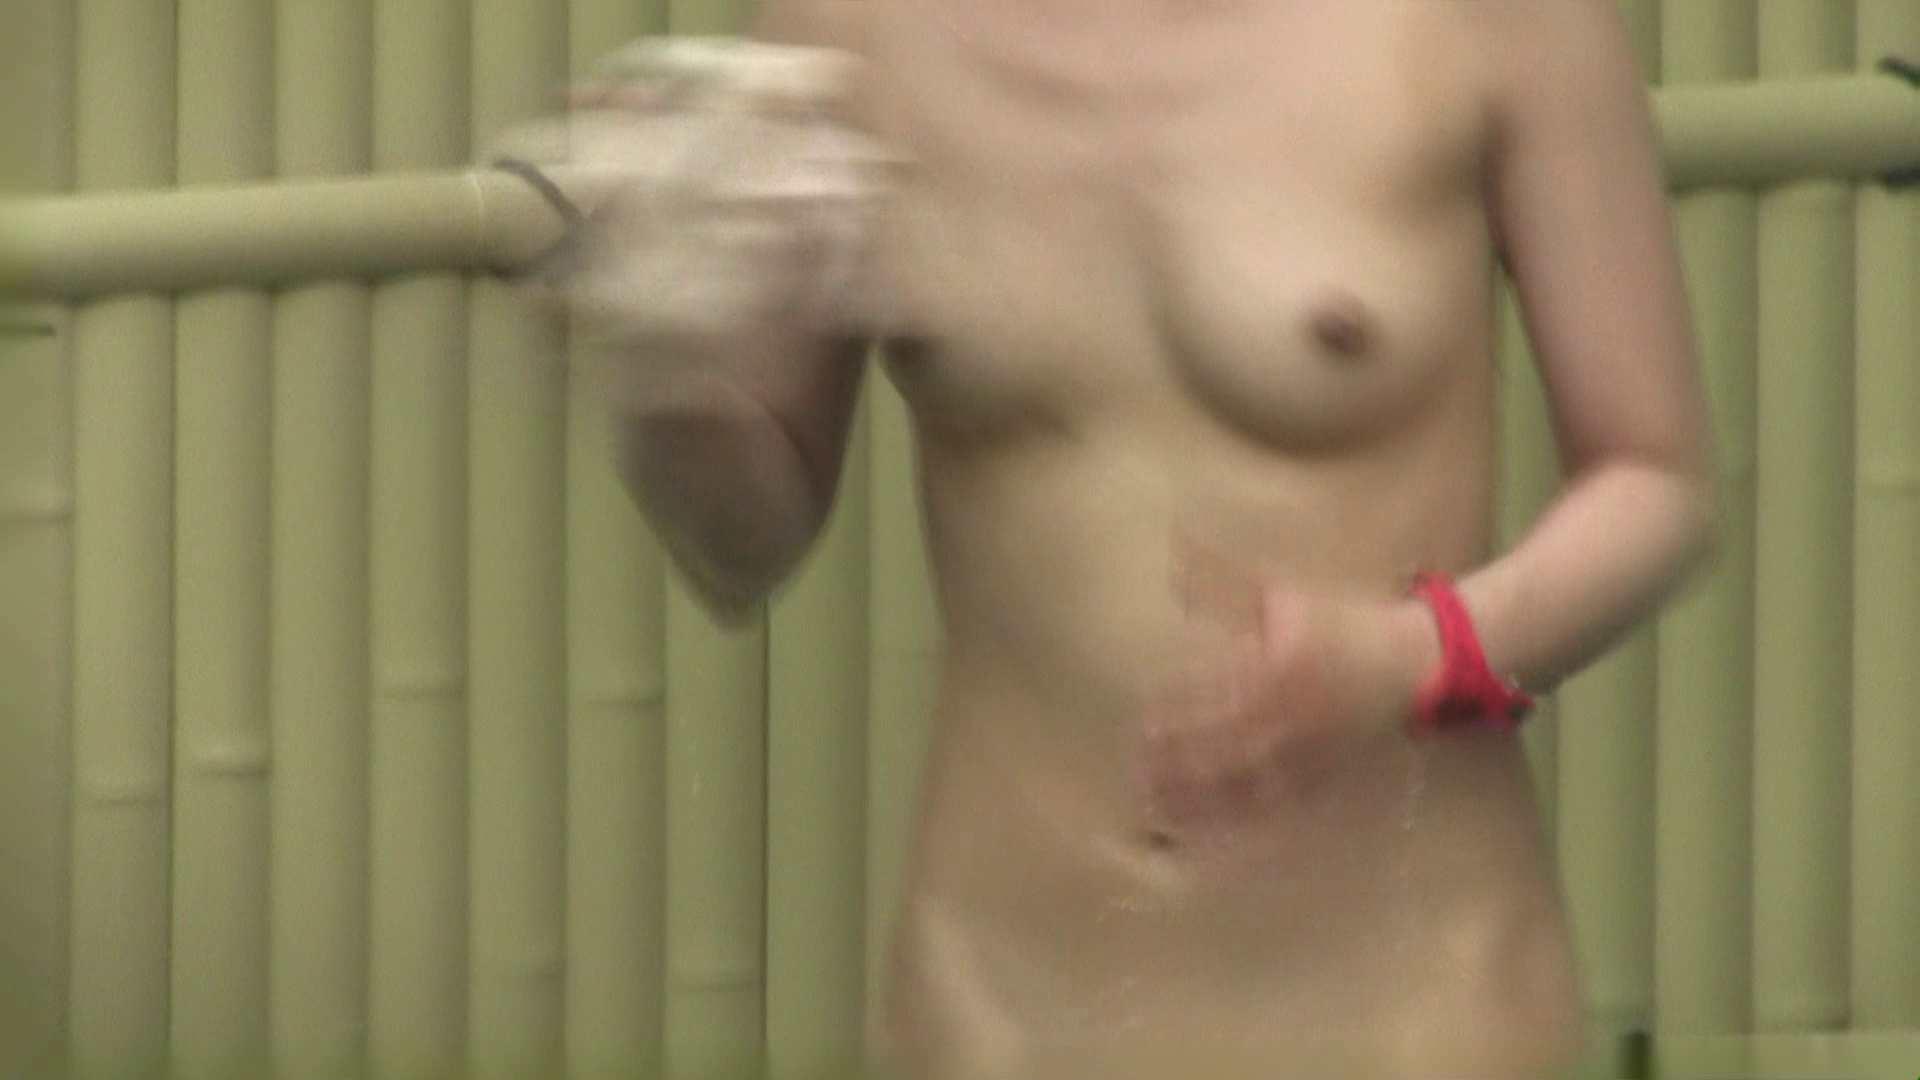 高画質露天女風呂観察 vol.032 女風呂 | OLのエロ生活  101連発 57